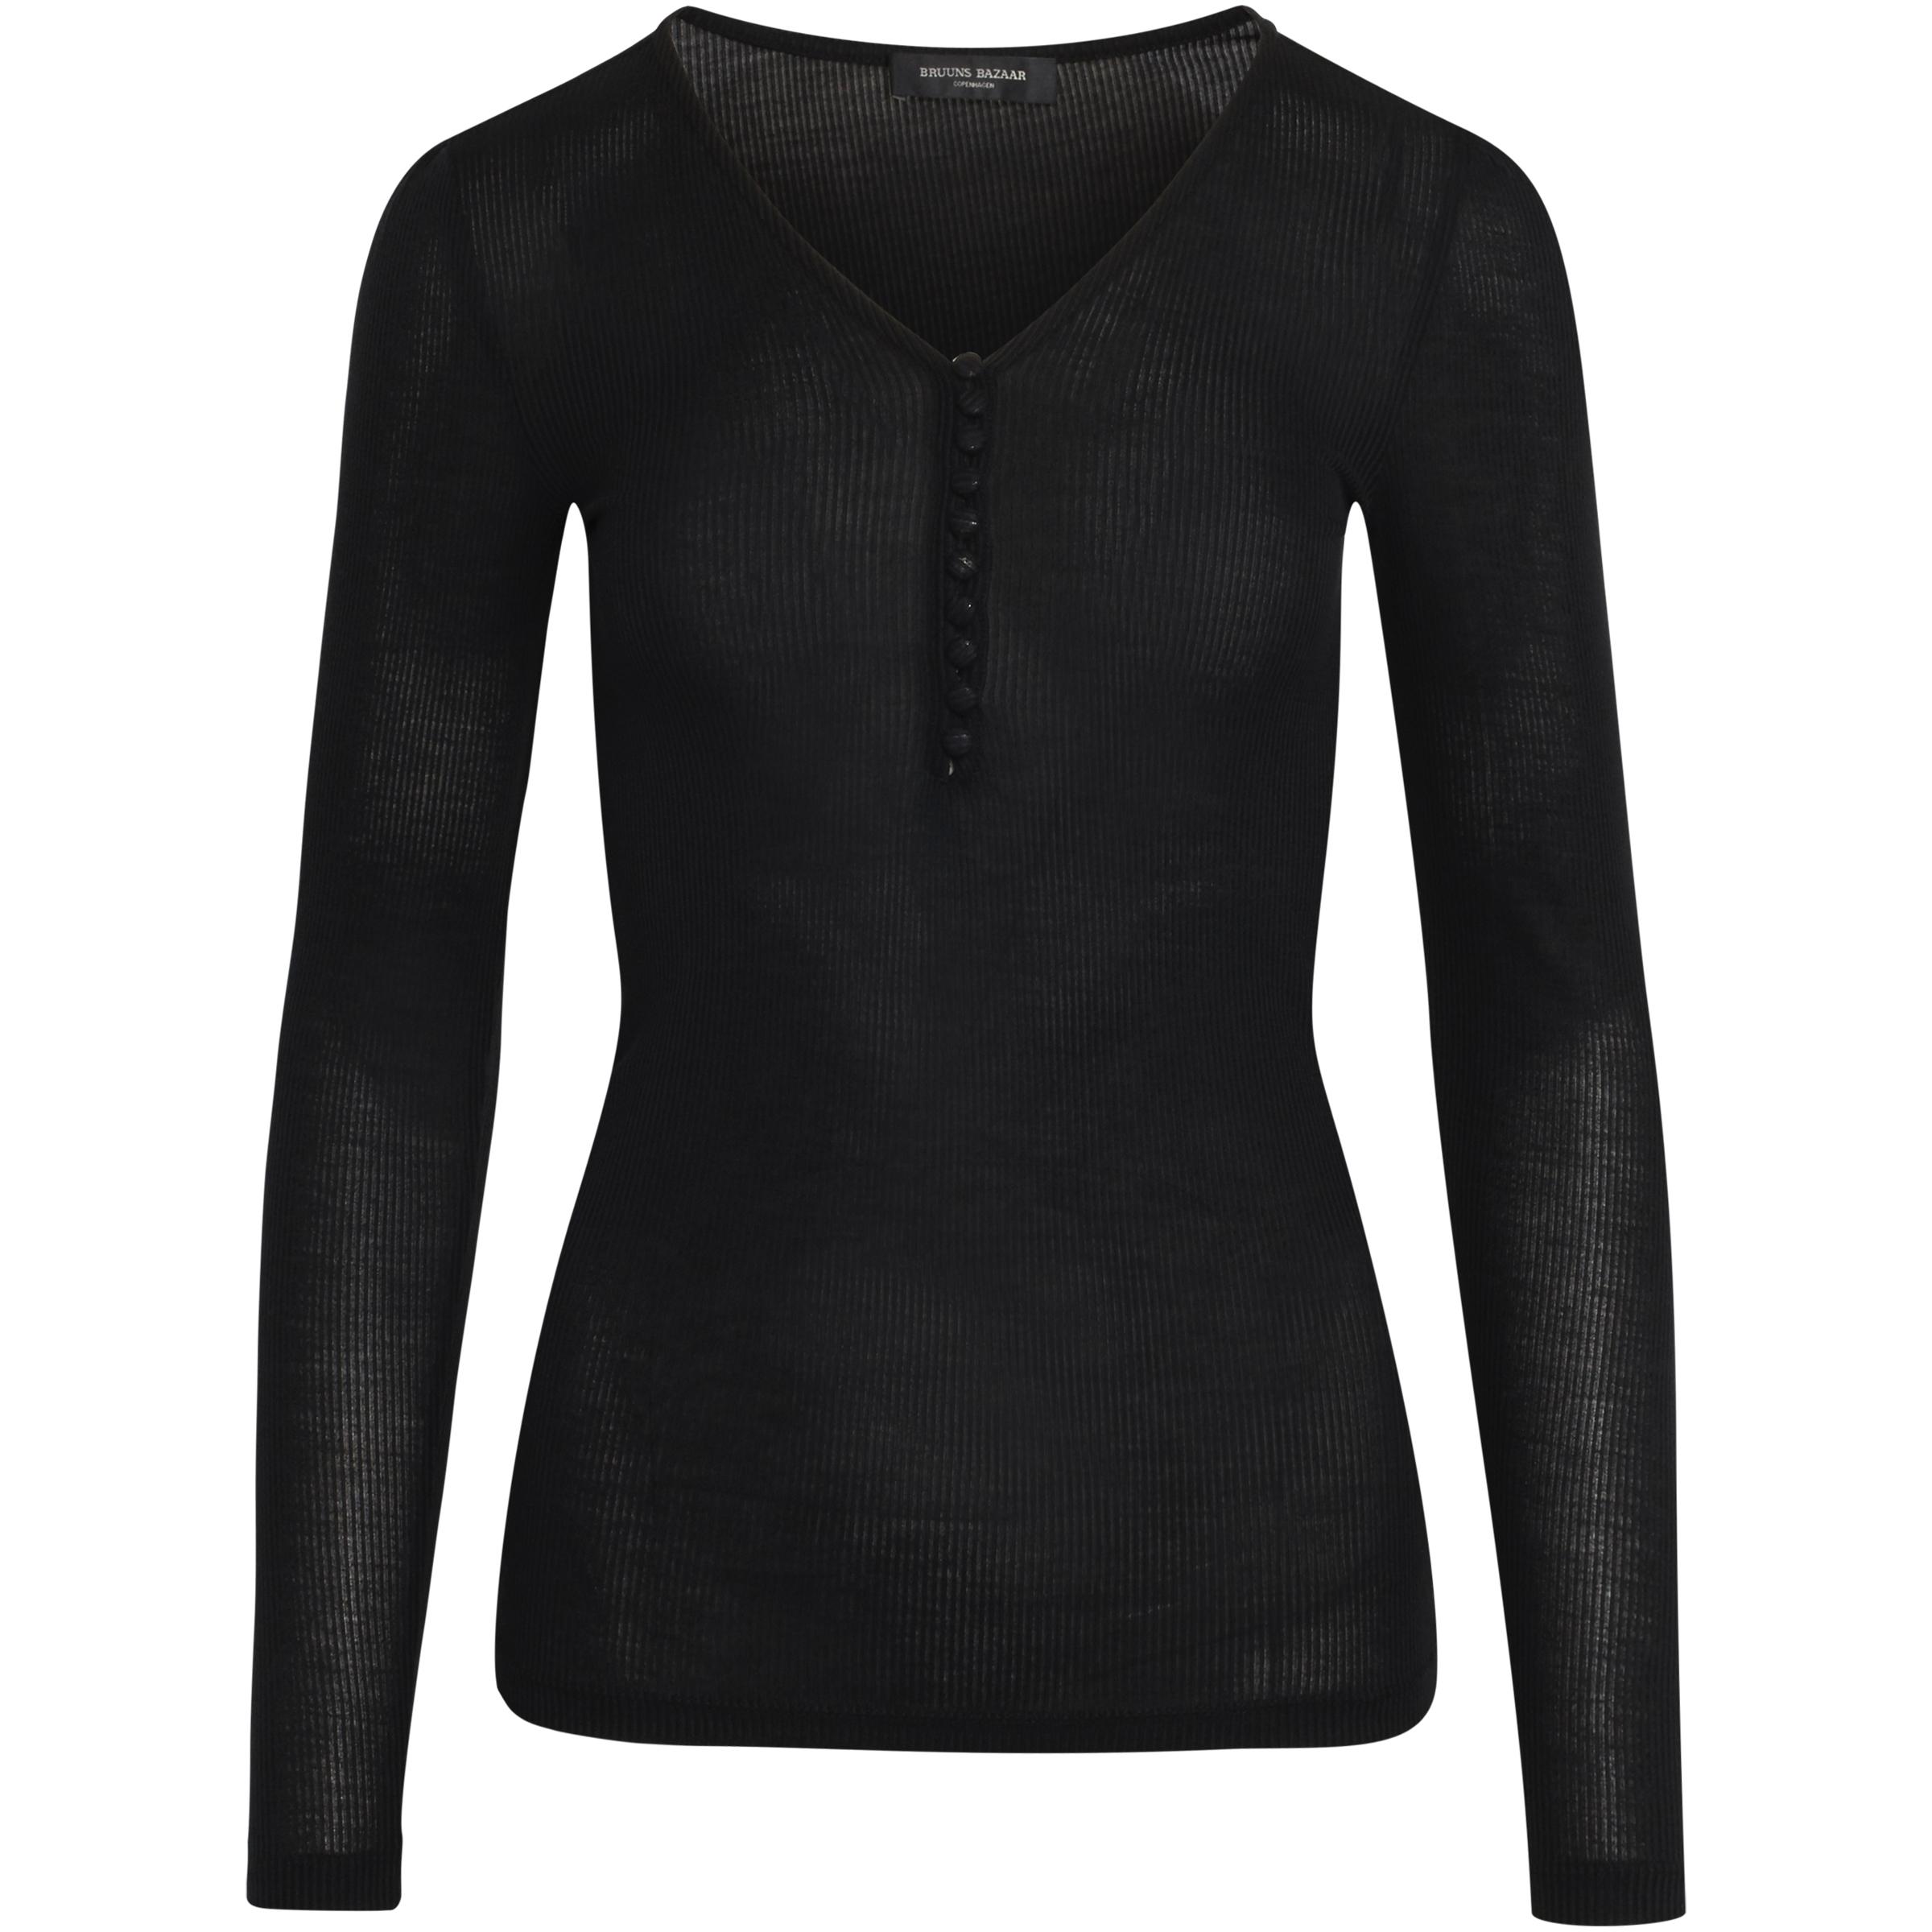 Katka Rib Jubi blouse